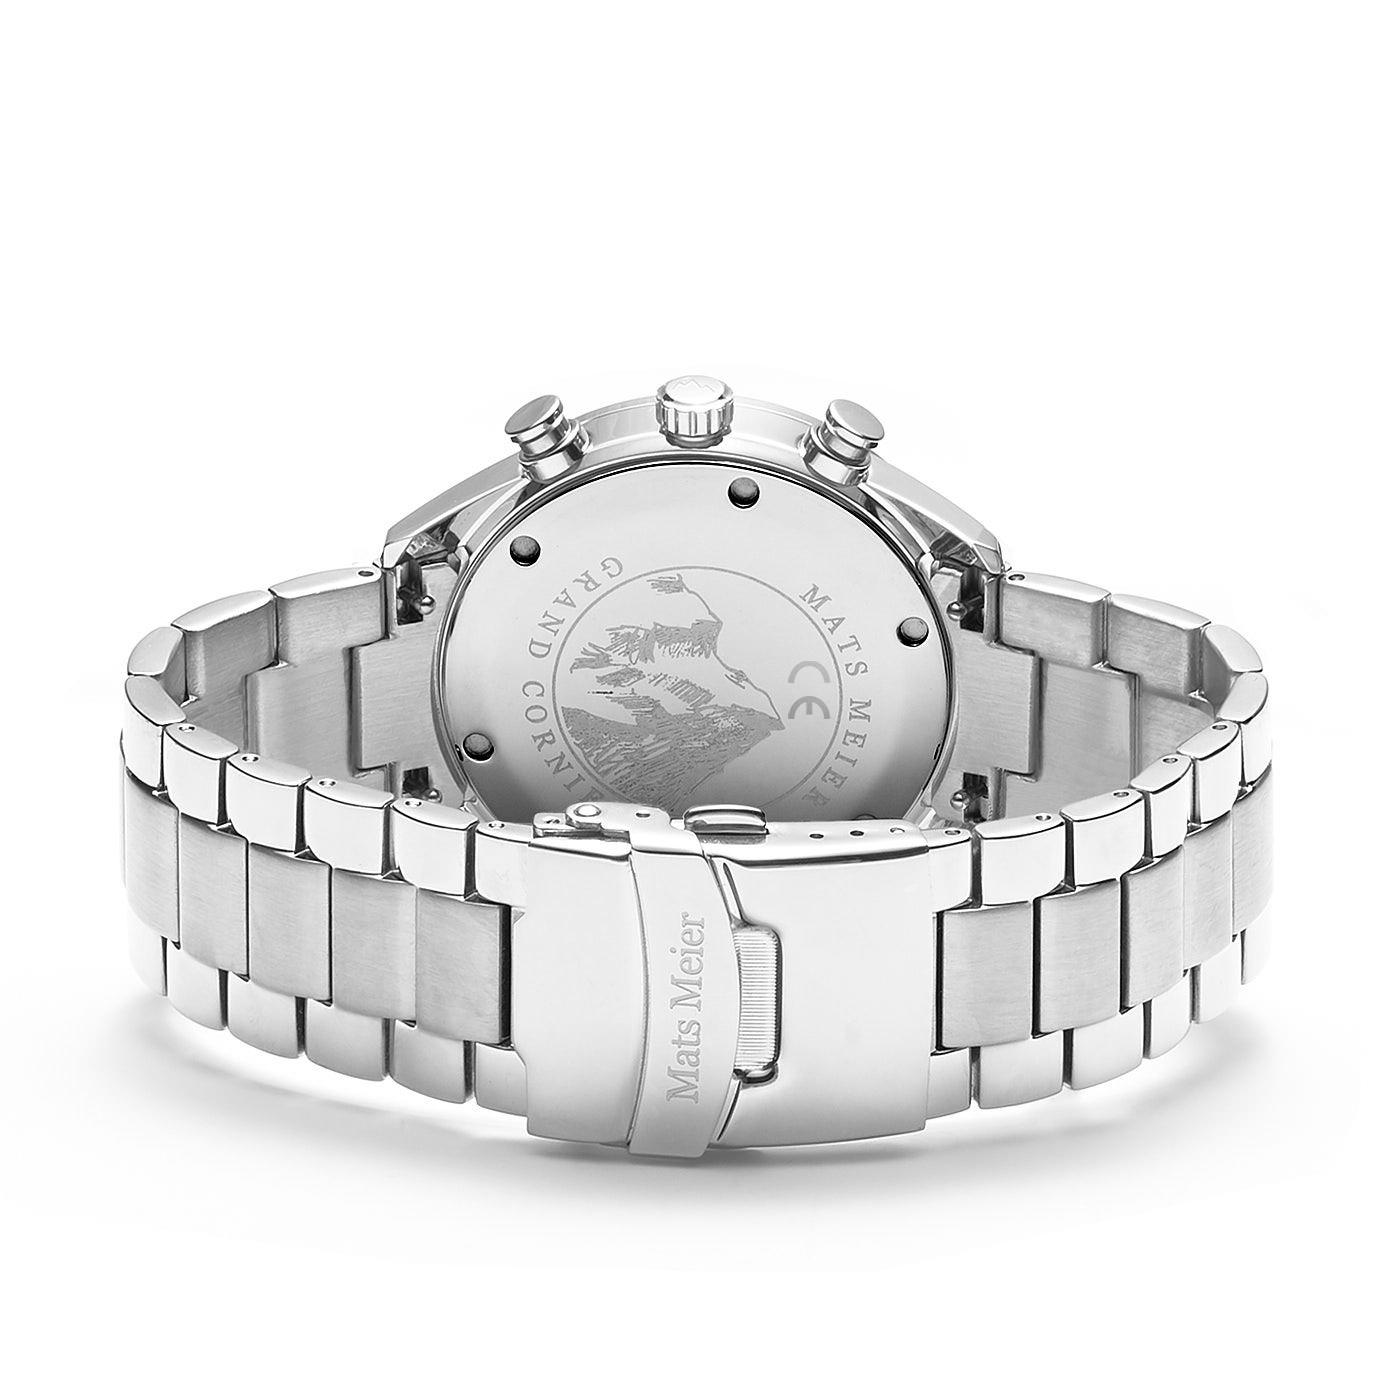 Mats Meier Grand Cornier chronograph mens watch black / silver colored